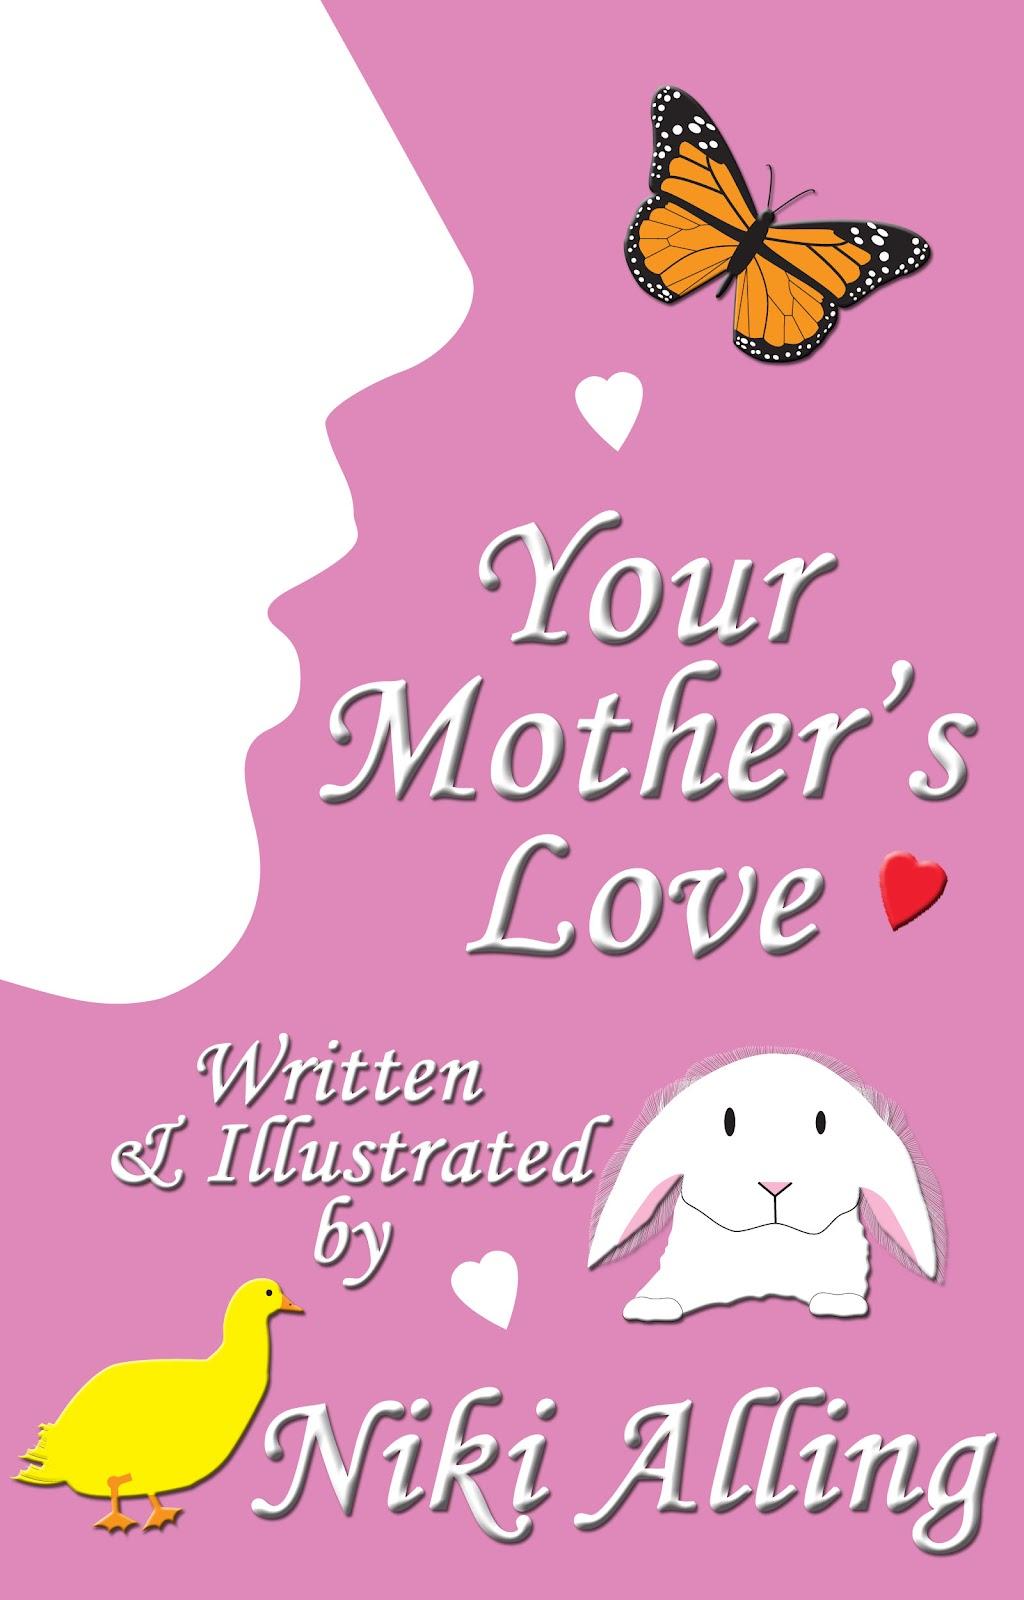 http://www.amazon.com/Your-Mothers-Love-Parents-ebook/dp/B007XL0E0U/ref=tmm_kin_swatch_0?_encoding=UTF8&sr=1-7&qid=1430449759